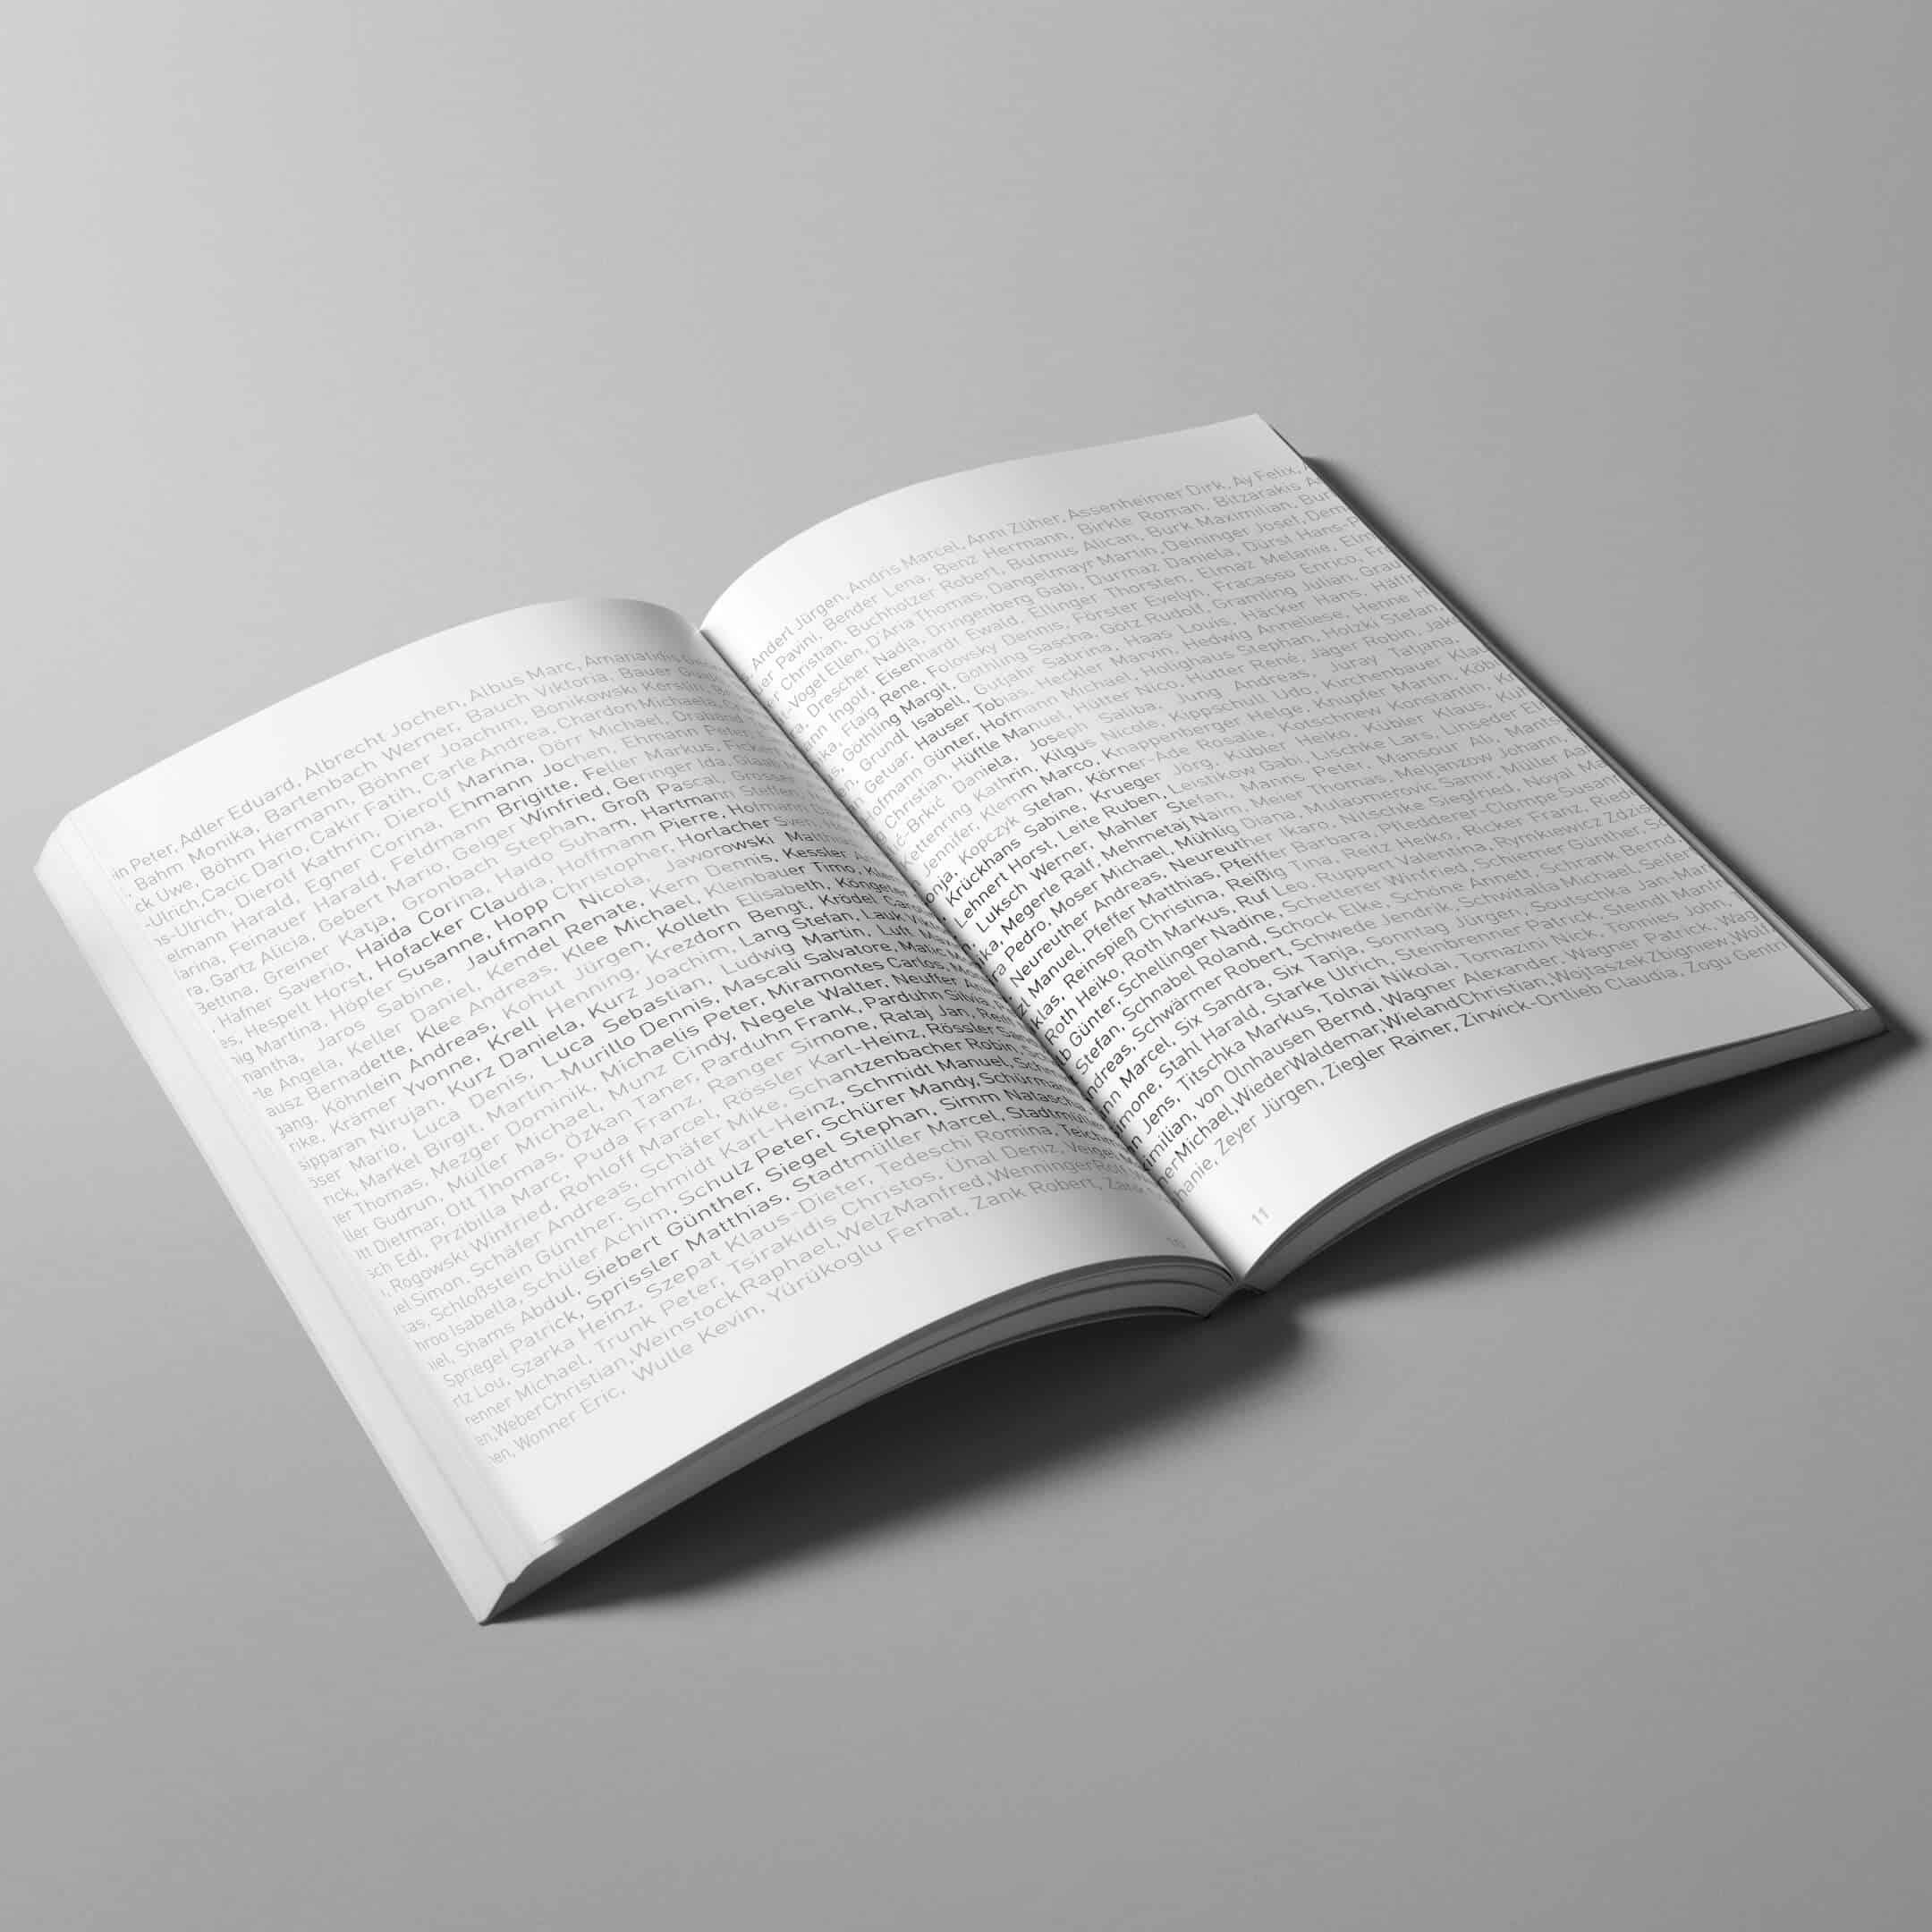 ASSMU-Kulturbuch-Innenseite1_Mobile